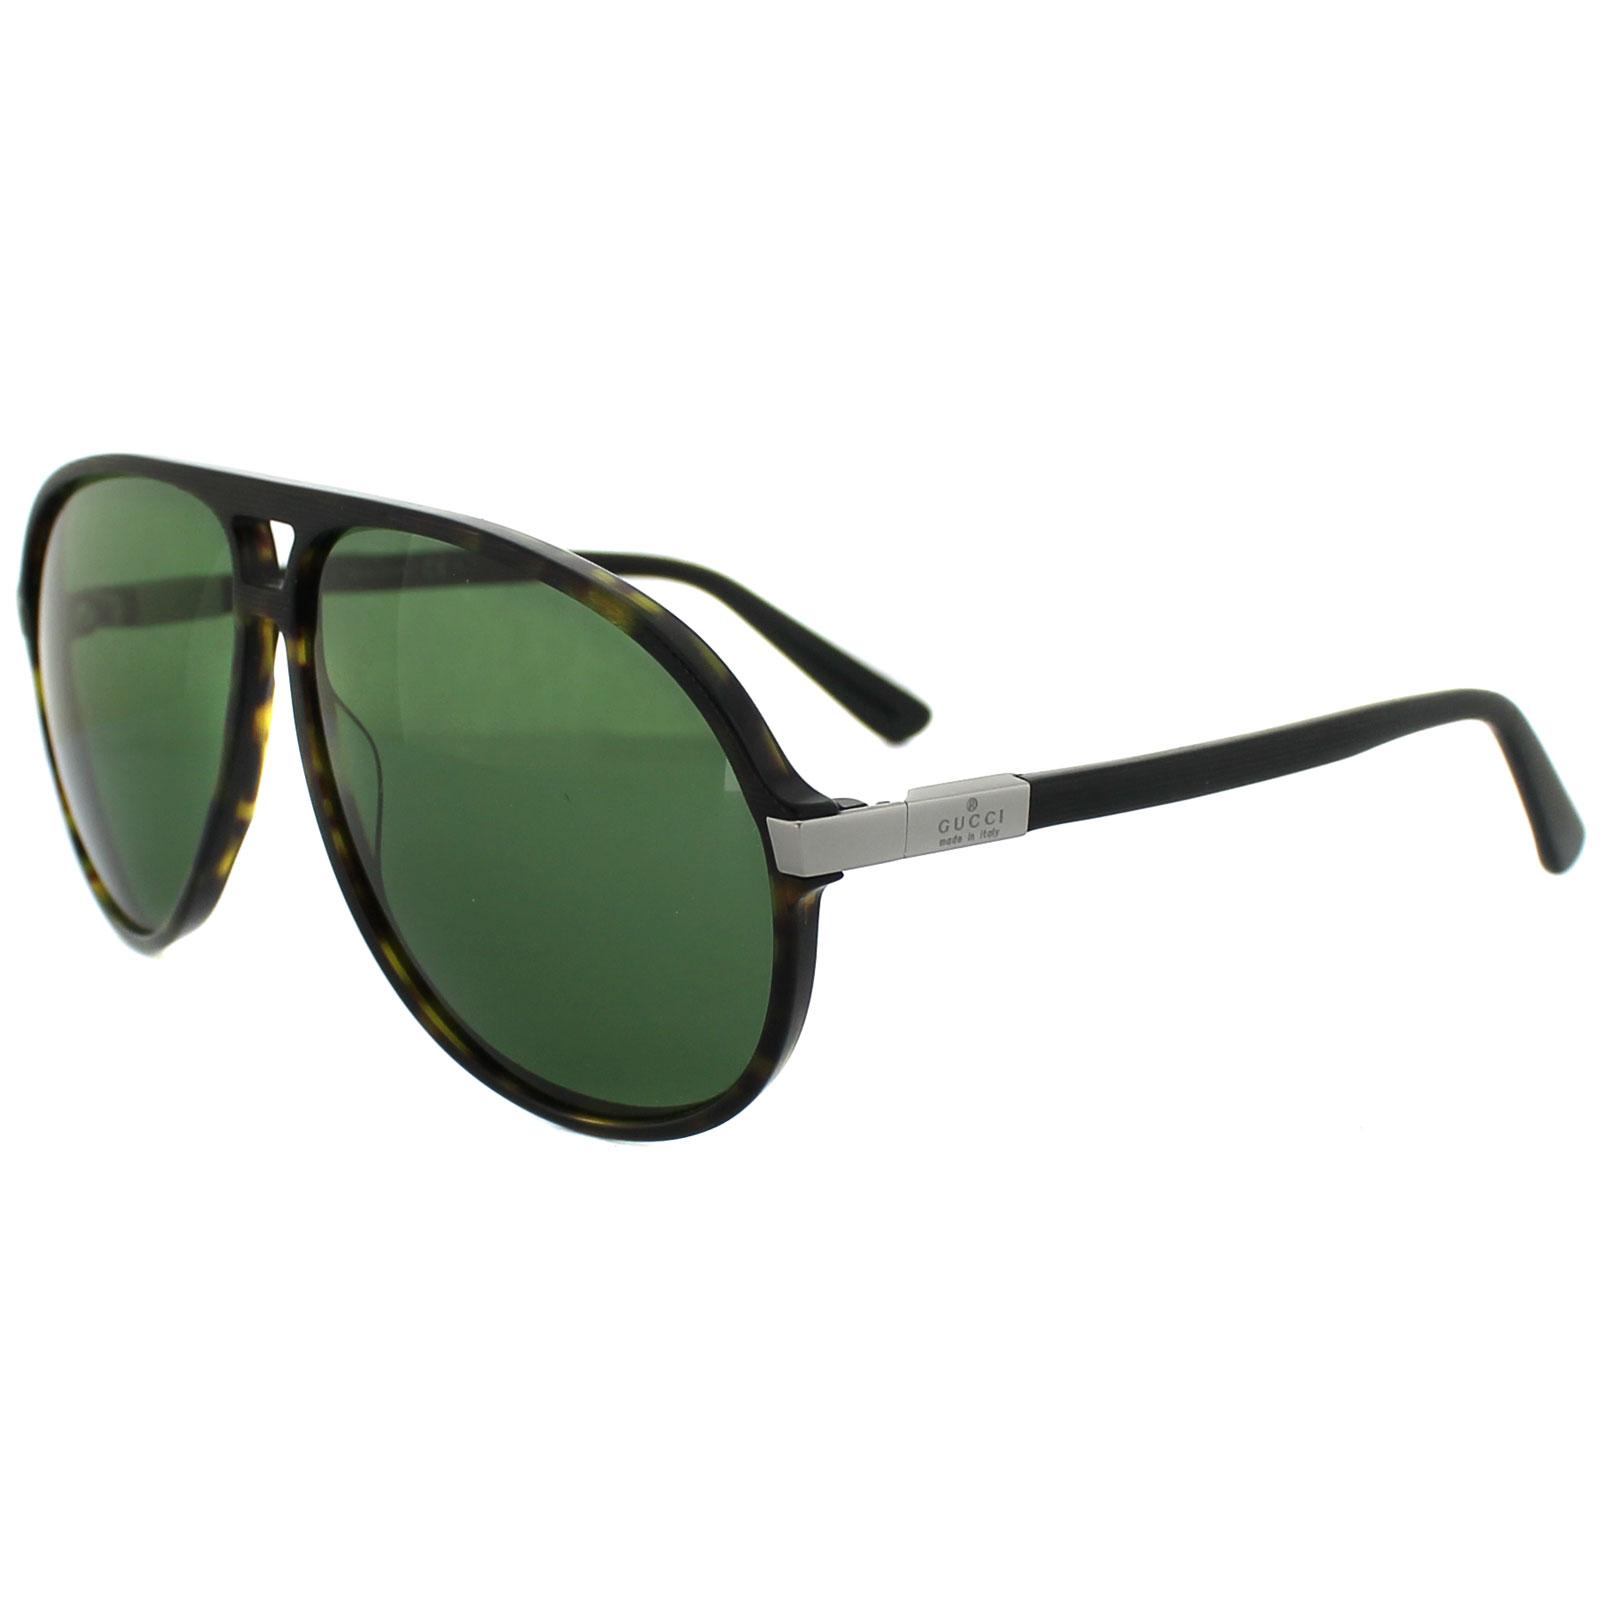 a52cb1c16d5 Gucci Aviator Sunglasses Deep Brown Green « Heritage Malta